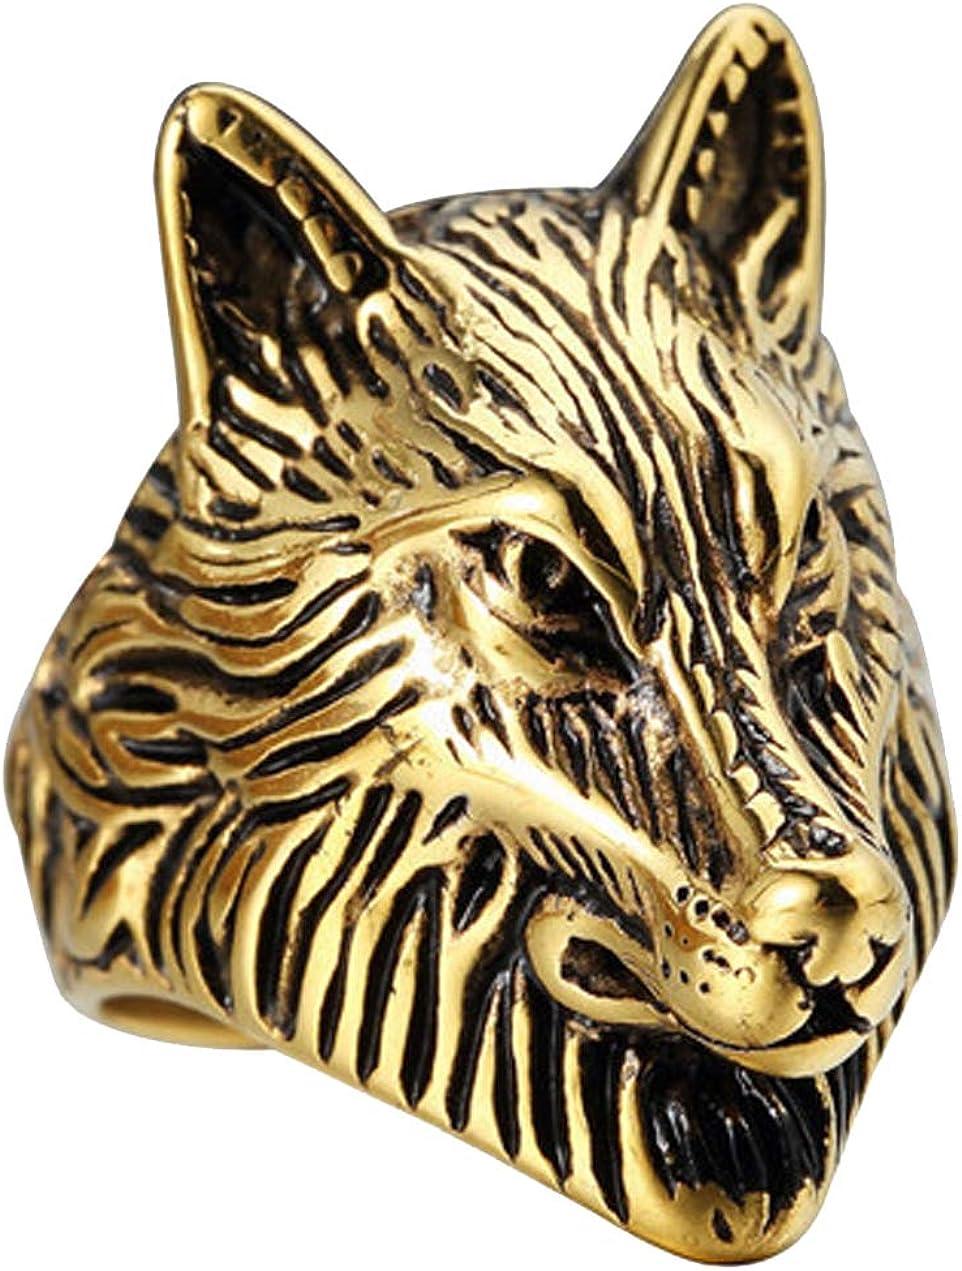 PAURO Men's Stainless Steel Gold Plated Vintage Wolf Head Biker Ring